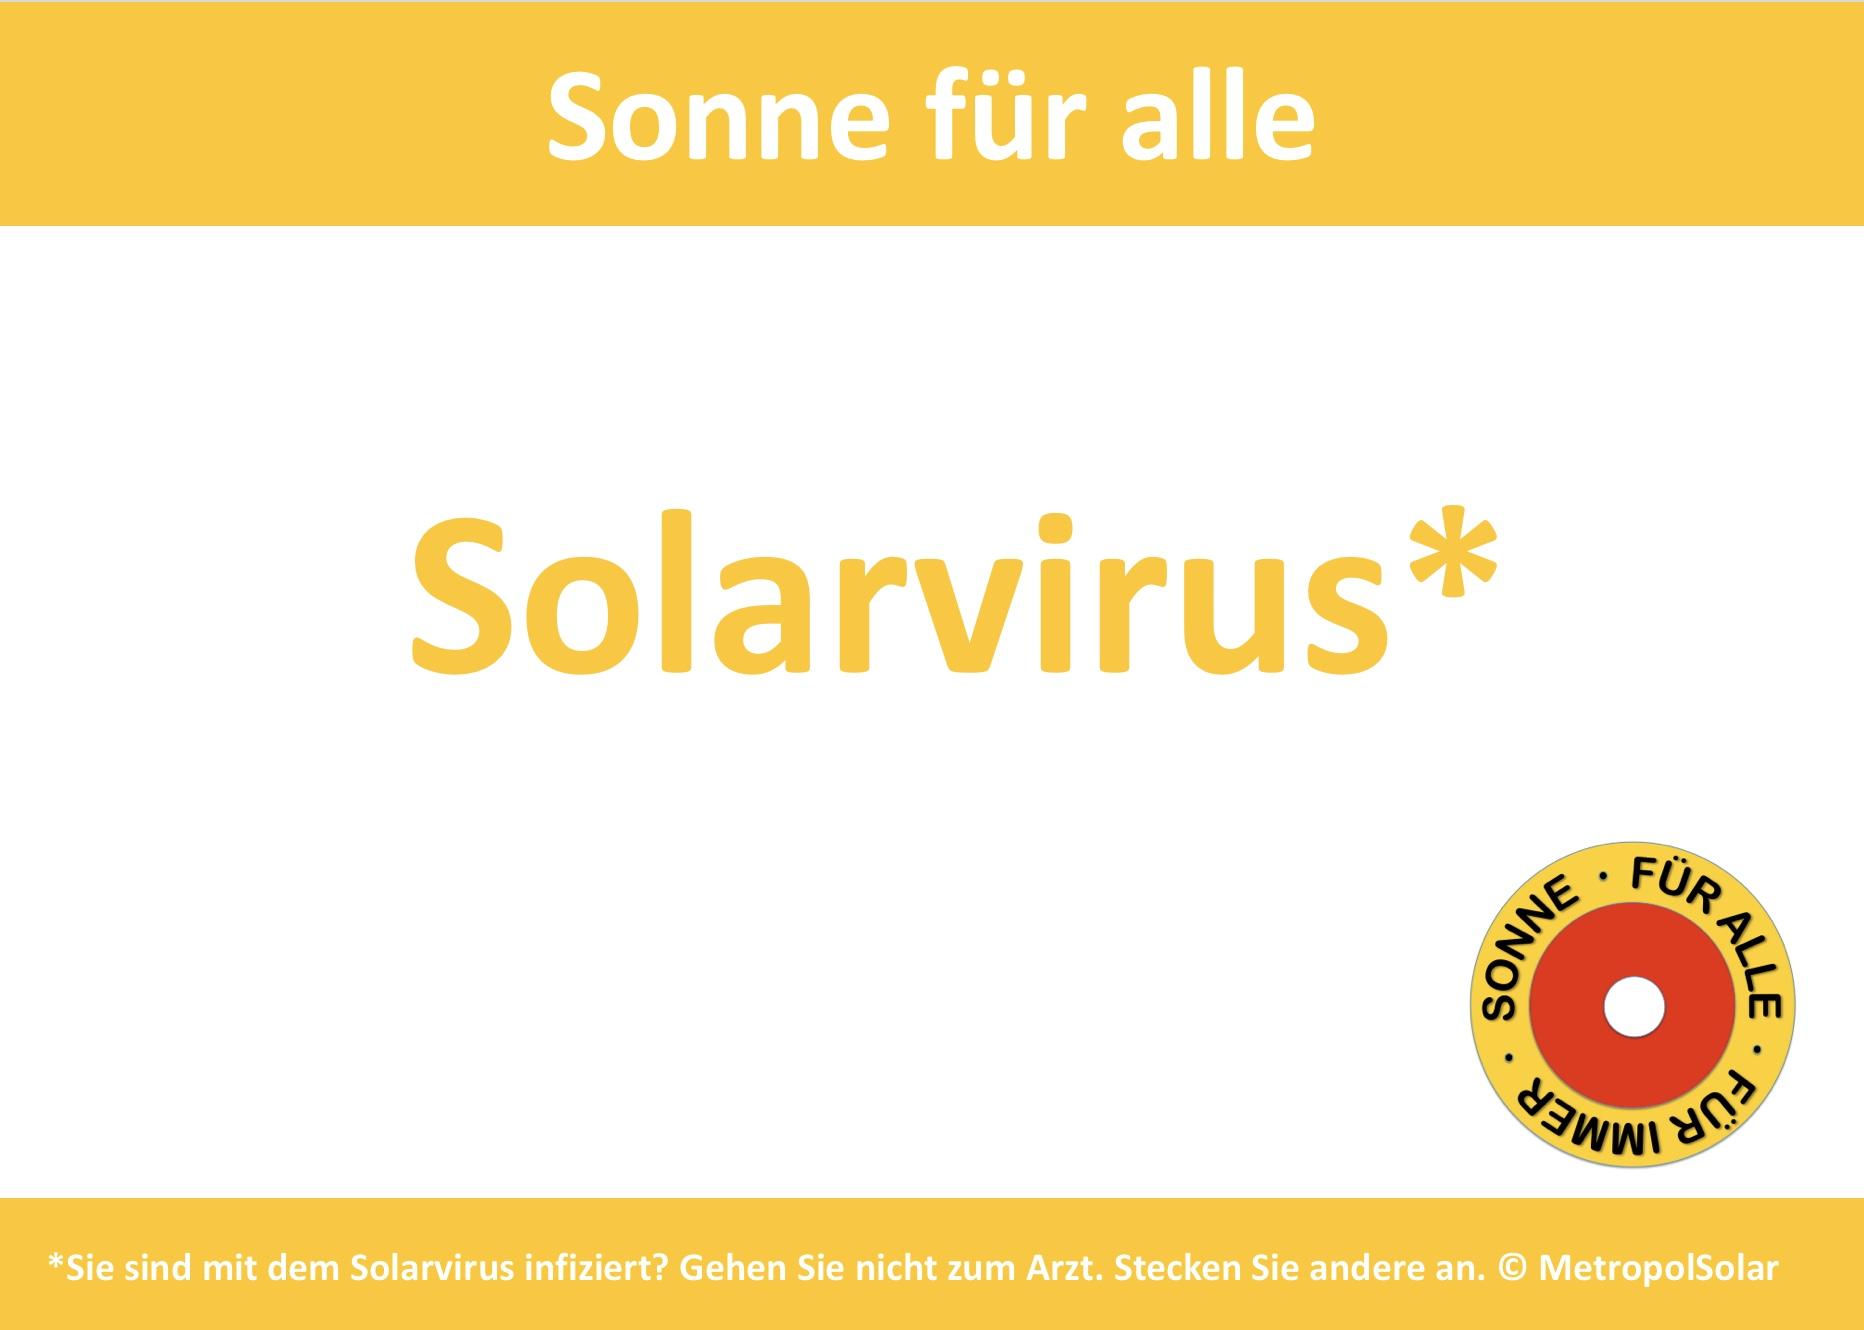 Solarvirus ©Metropolsolar